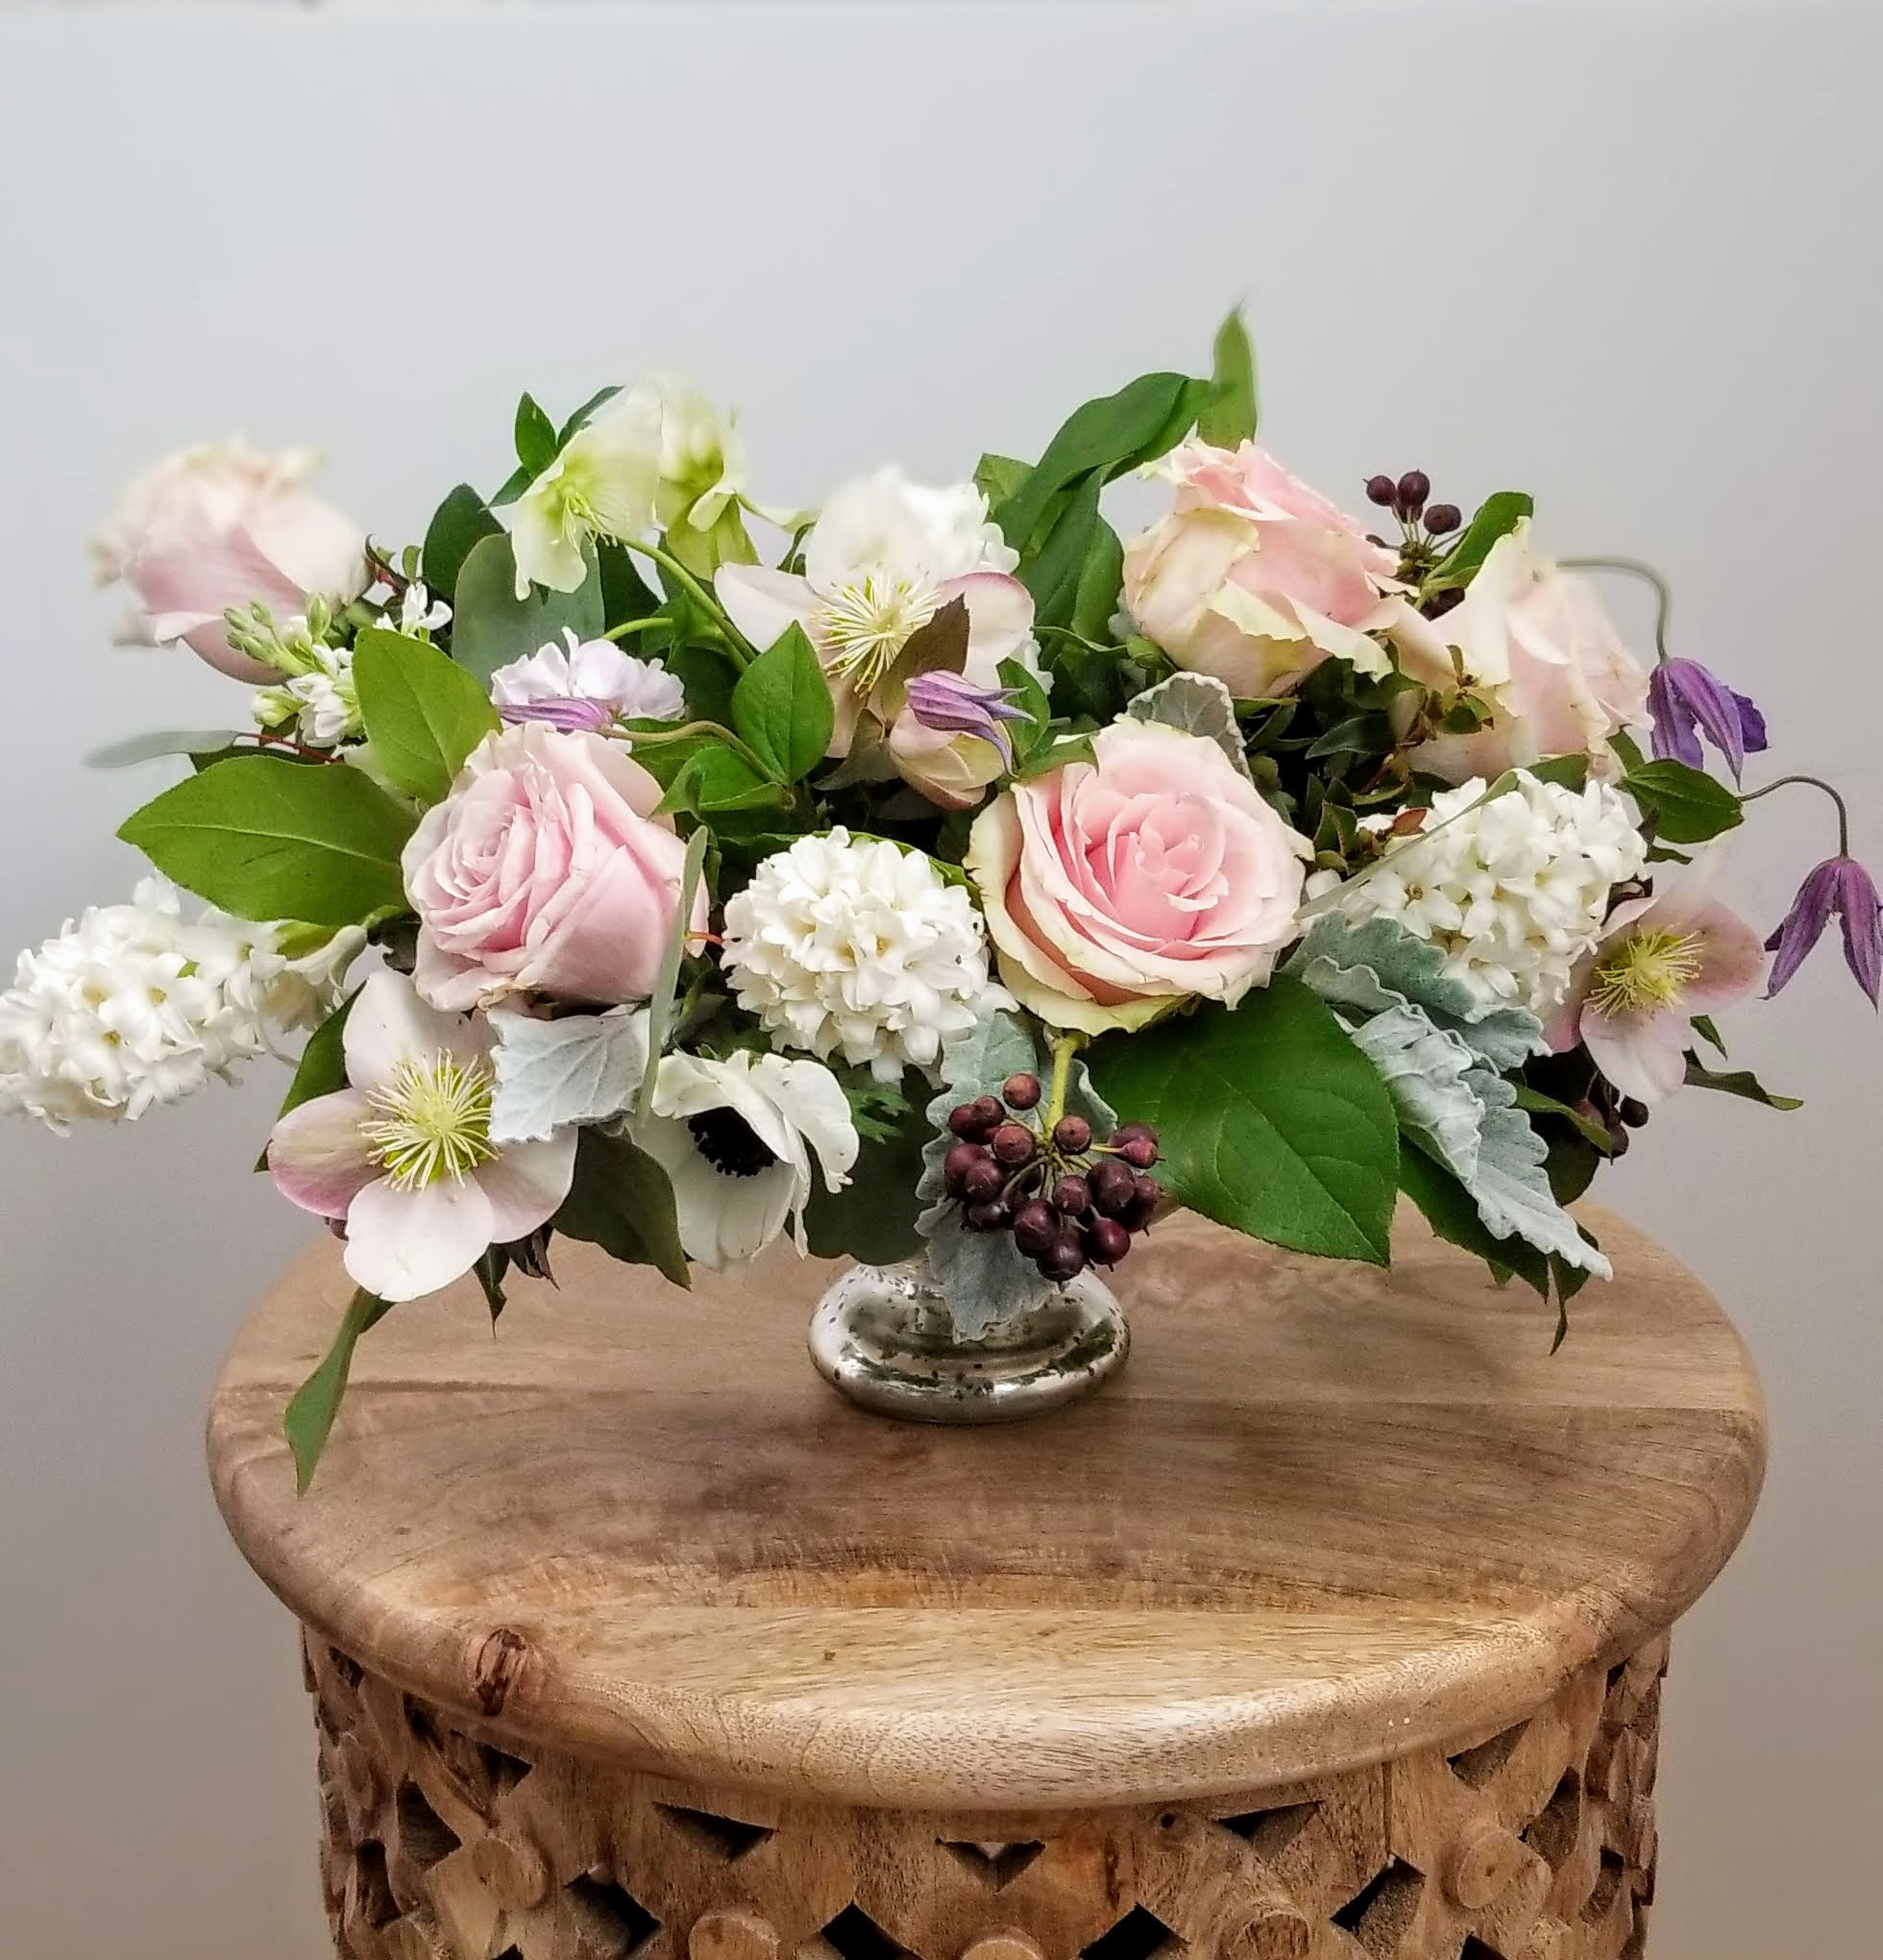 Blush wedding table centerpiece